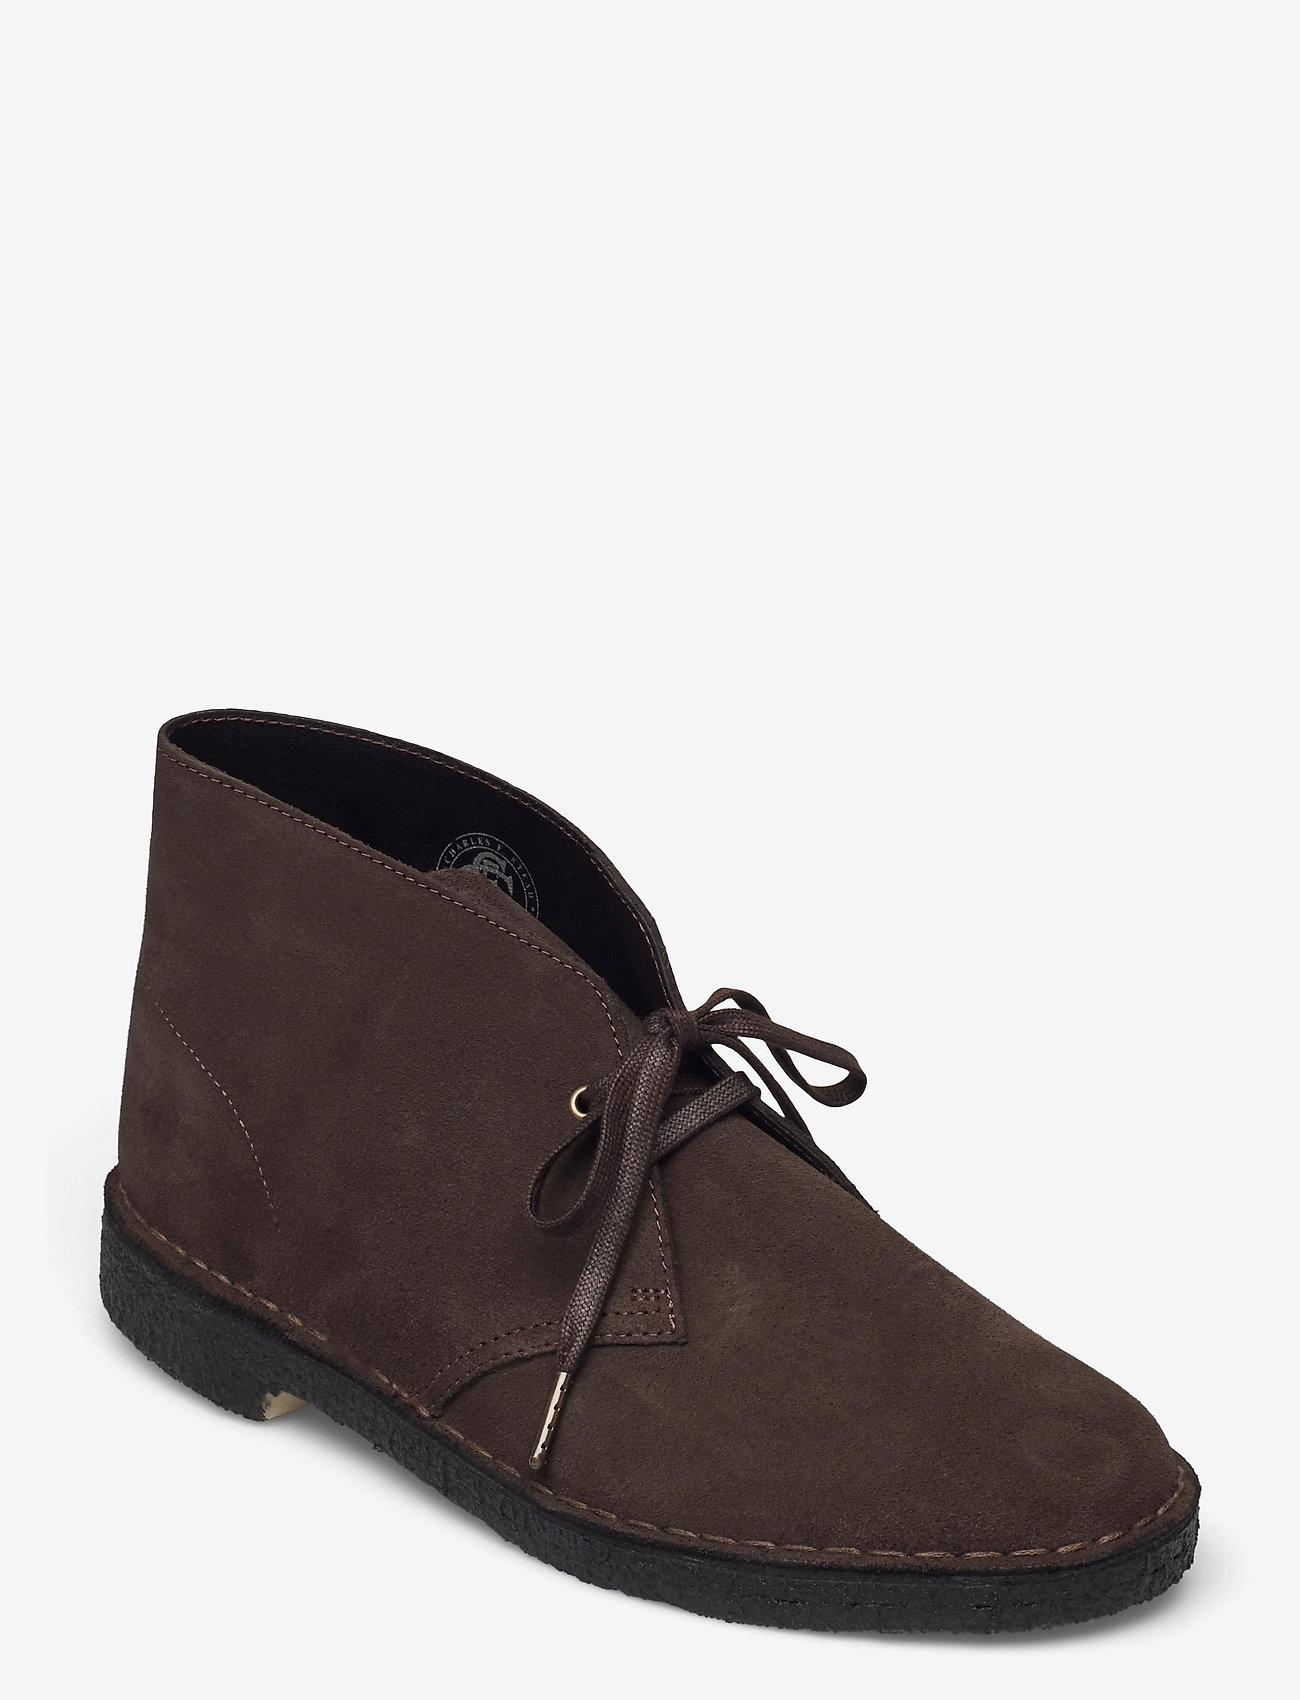 Clarks Originals - Desert Boot - Ökenkängor - brown sde - 0